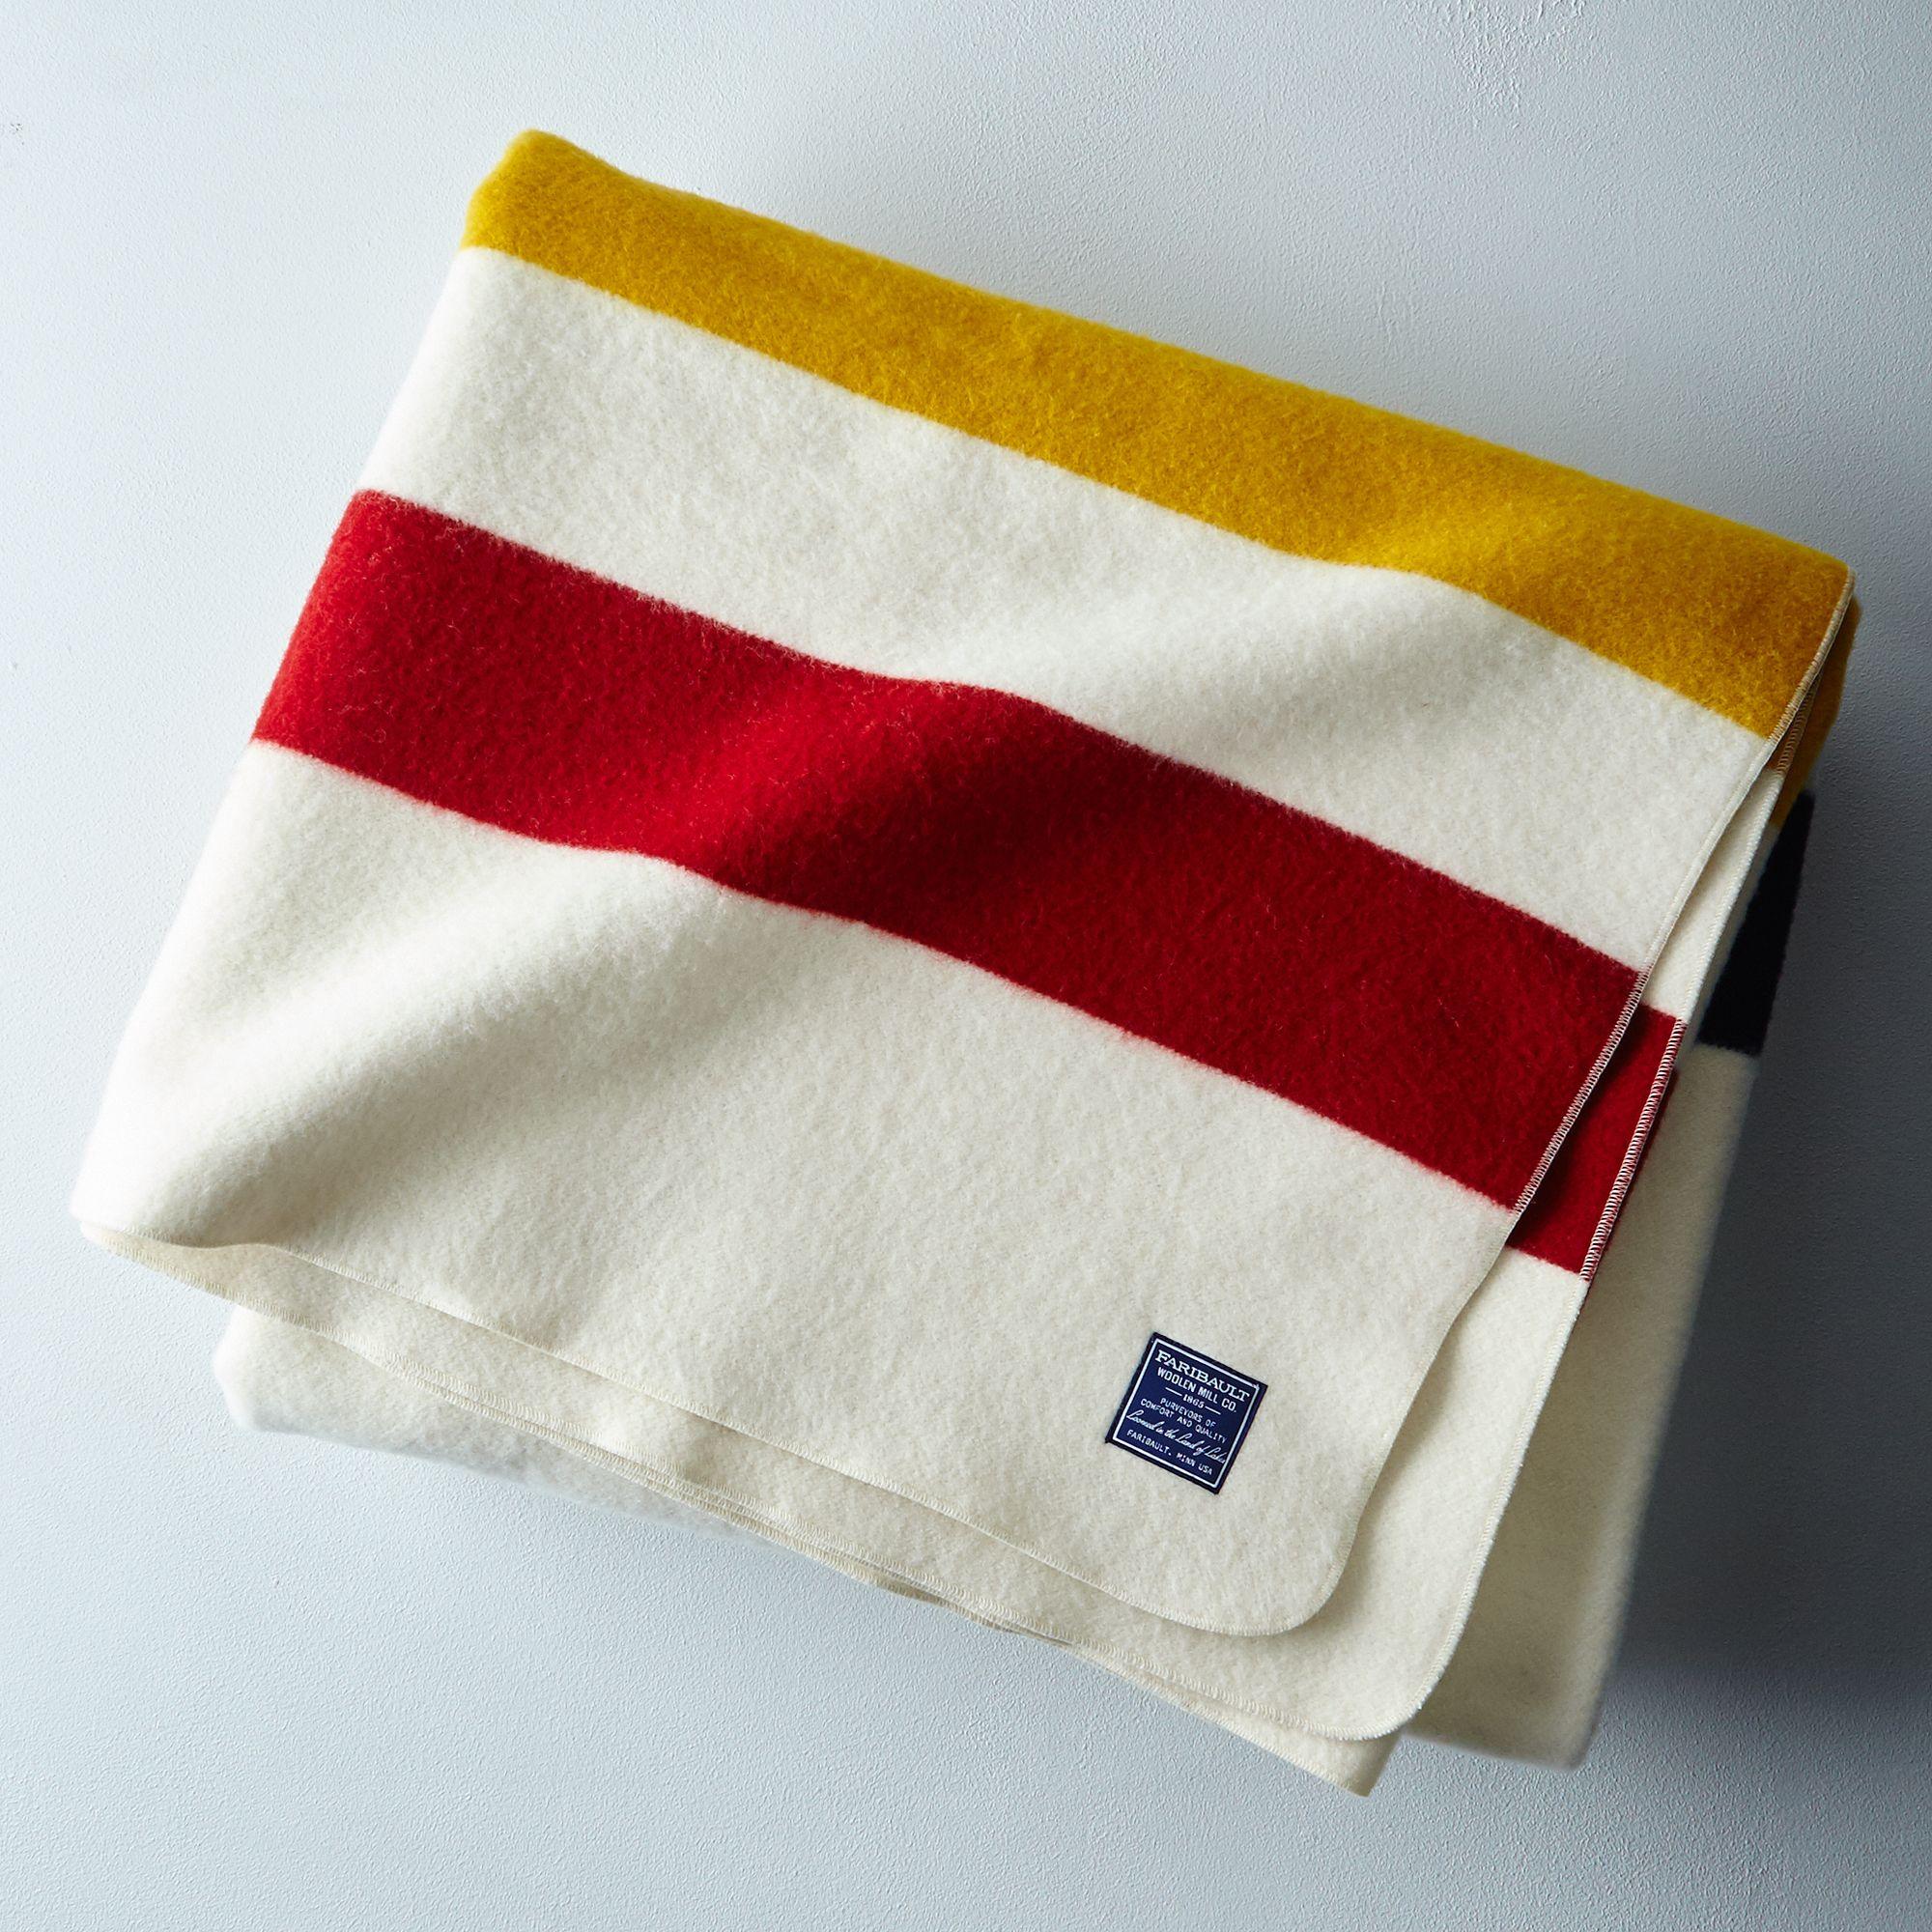 Cb24ccae 61f8 42b3 aa3b 083479a38fb1  2016 0203 faribault revival stripe queen blanket white silo rocky luten 016